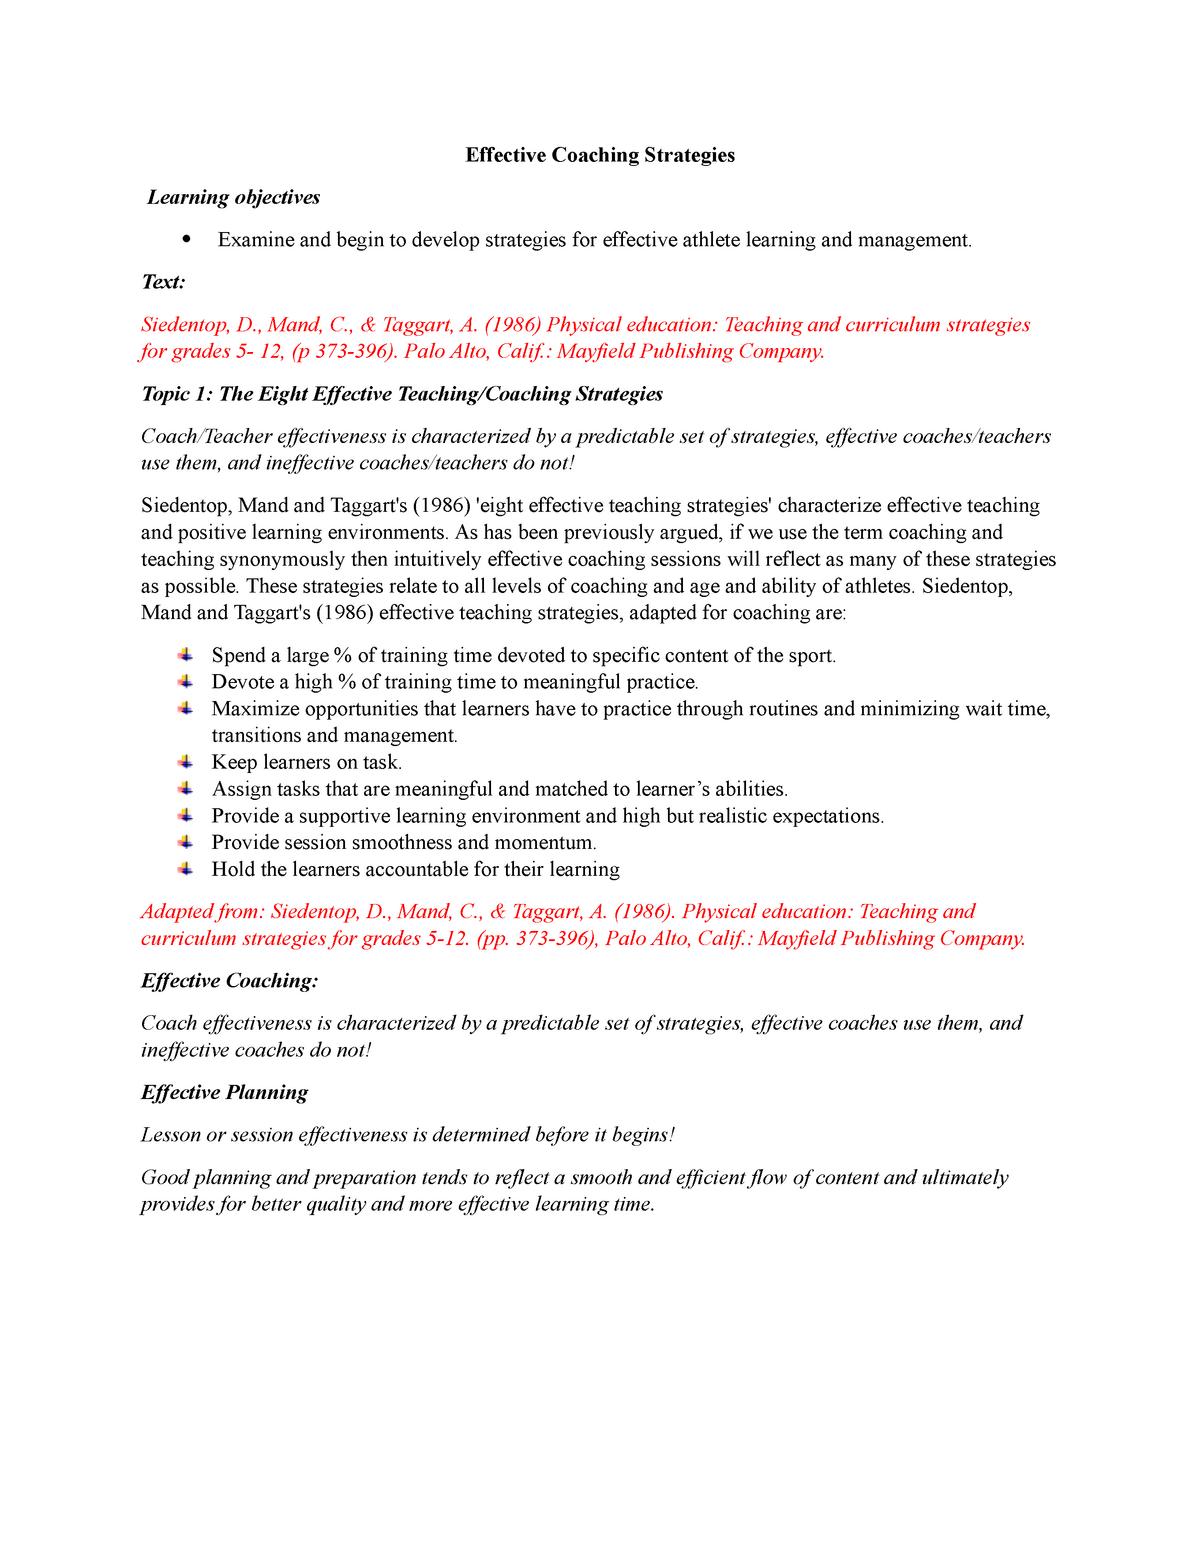 Effective Coaching Strategies Notes - SPCO101 - StuDocu